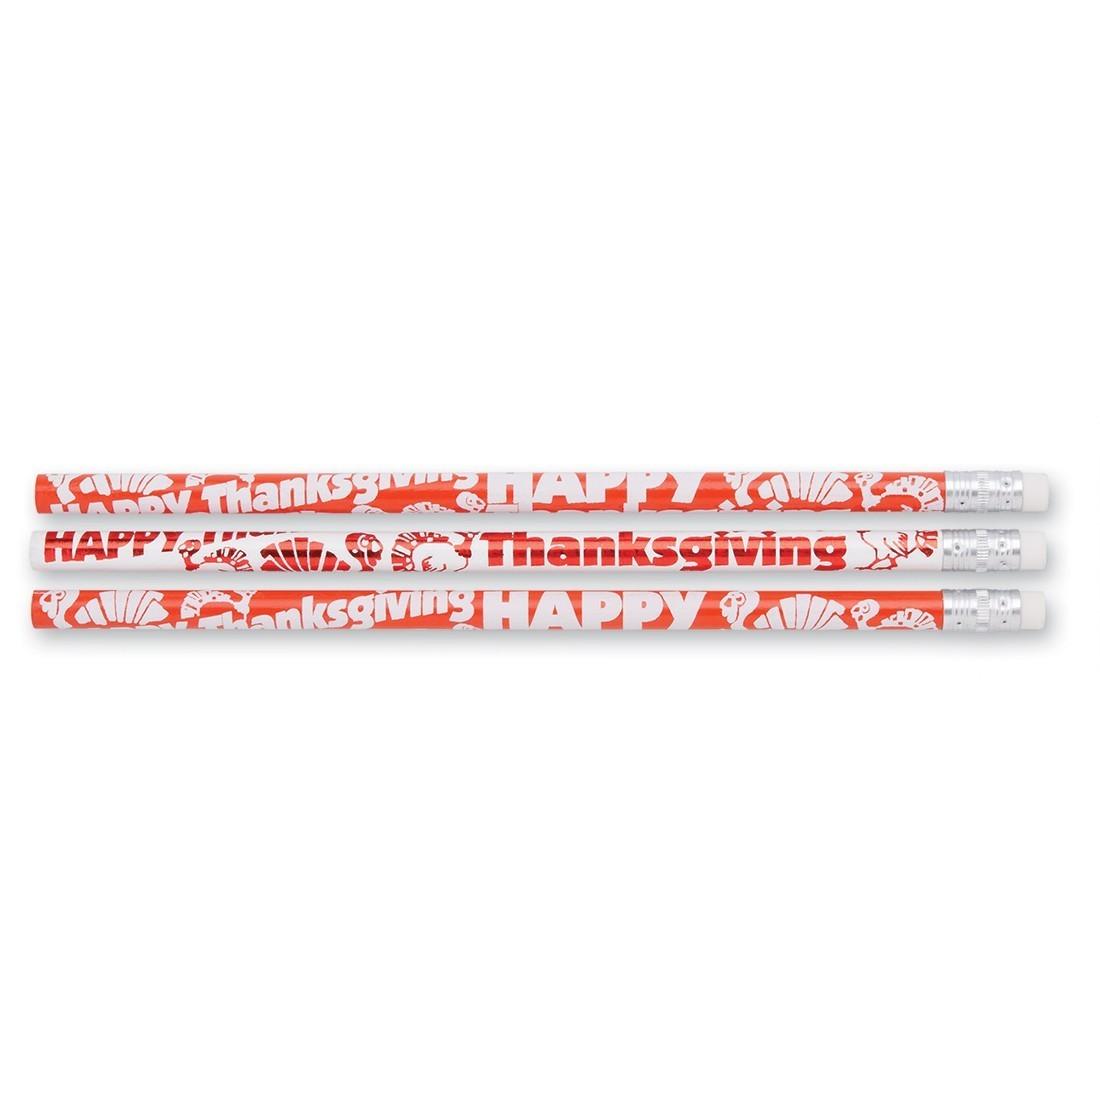 Thanksgiving Pencils [image]